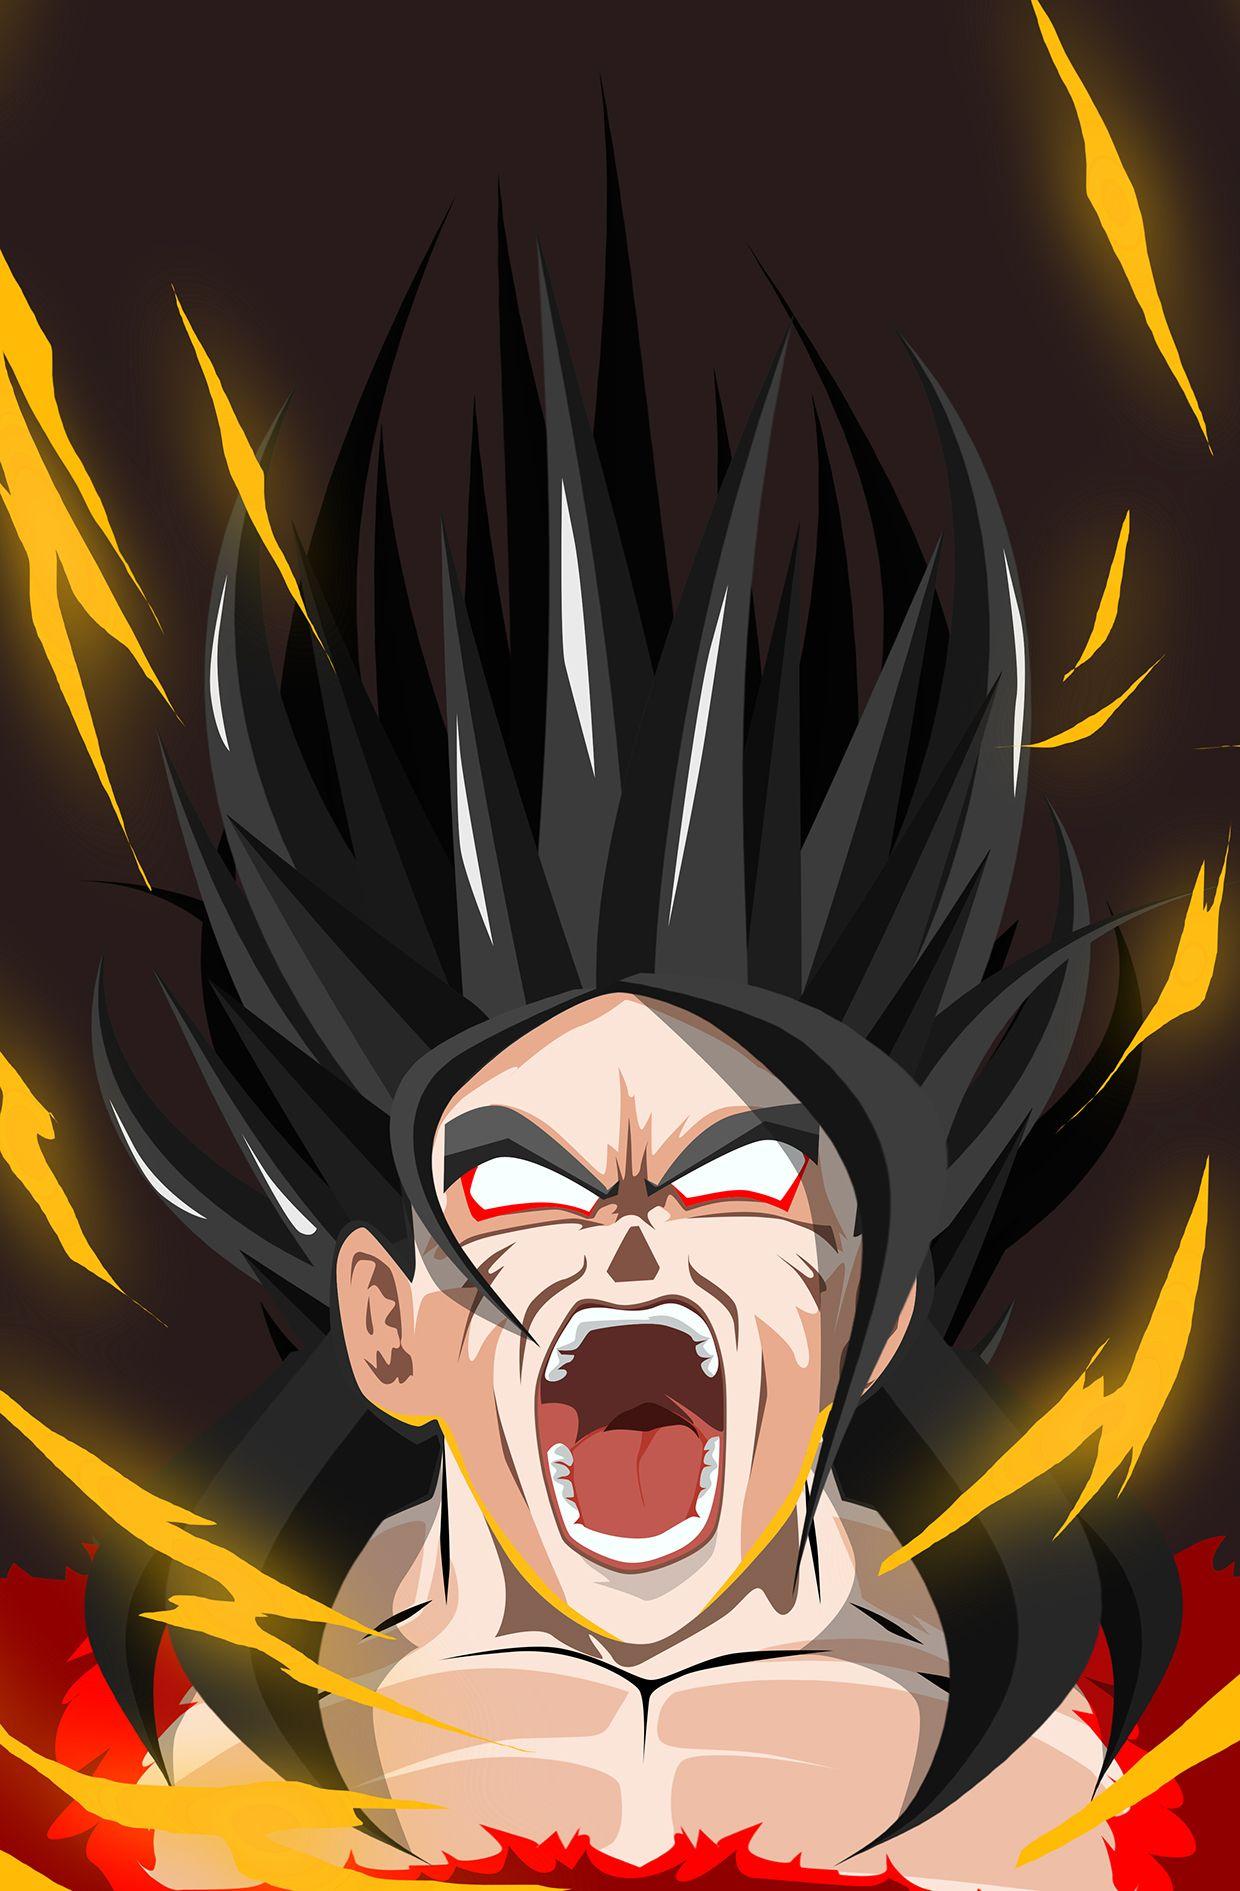 Rage Series By Kode Logic Goku Super Saiya 4 Dragon Ball Z Iphone Wallpaper Anime Dragon Ball Dragon Ball Z